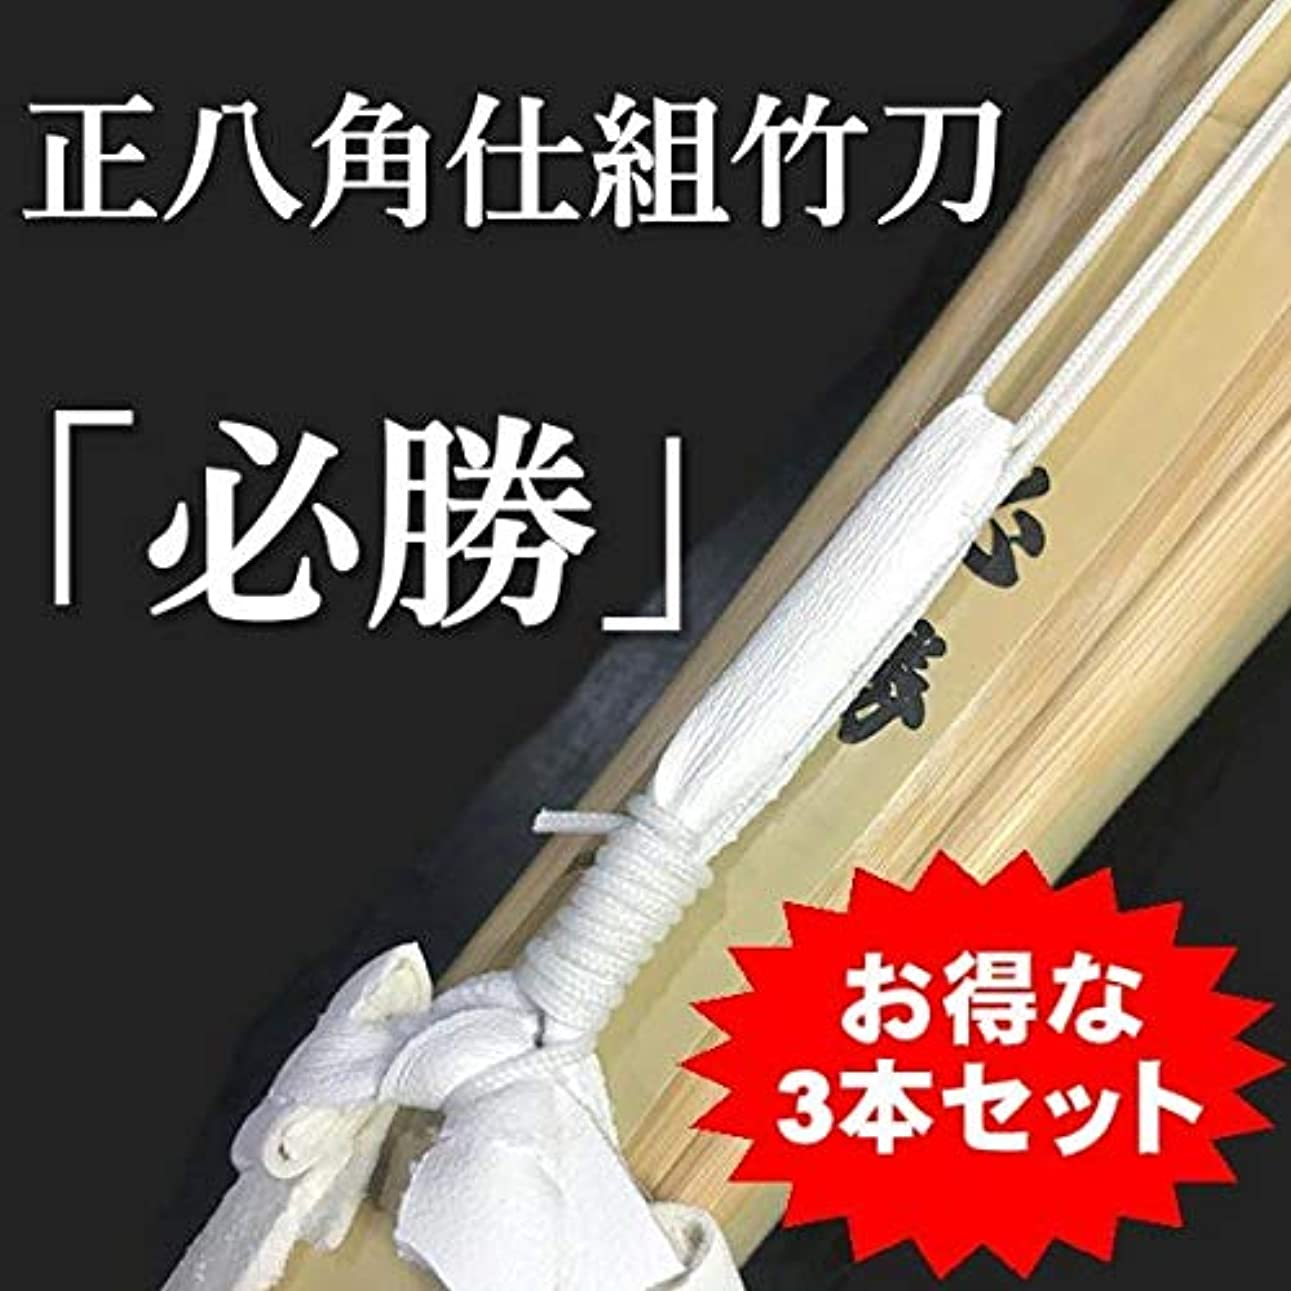 異議特殊先見の明竹刀3本セット 正八角(37男女) SSP 完成竹刀 必勝